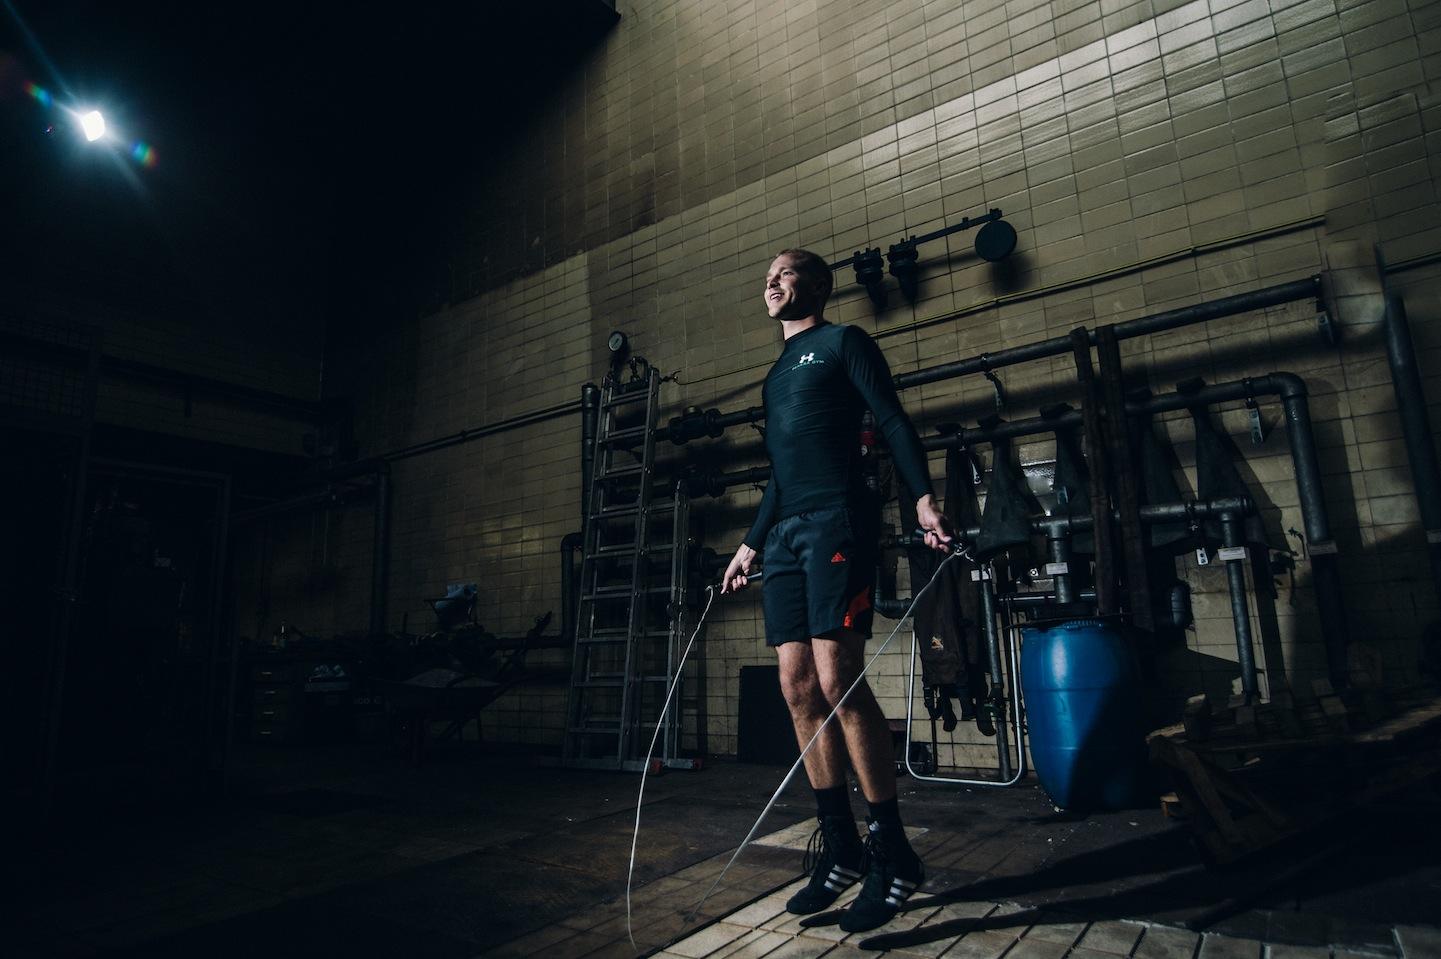 Ganzkörpertraining, Boxen, Stress, Christoph Teege